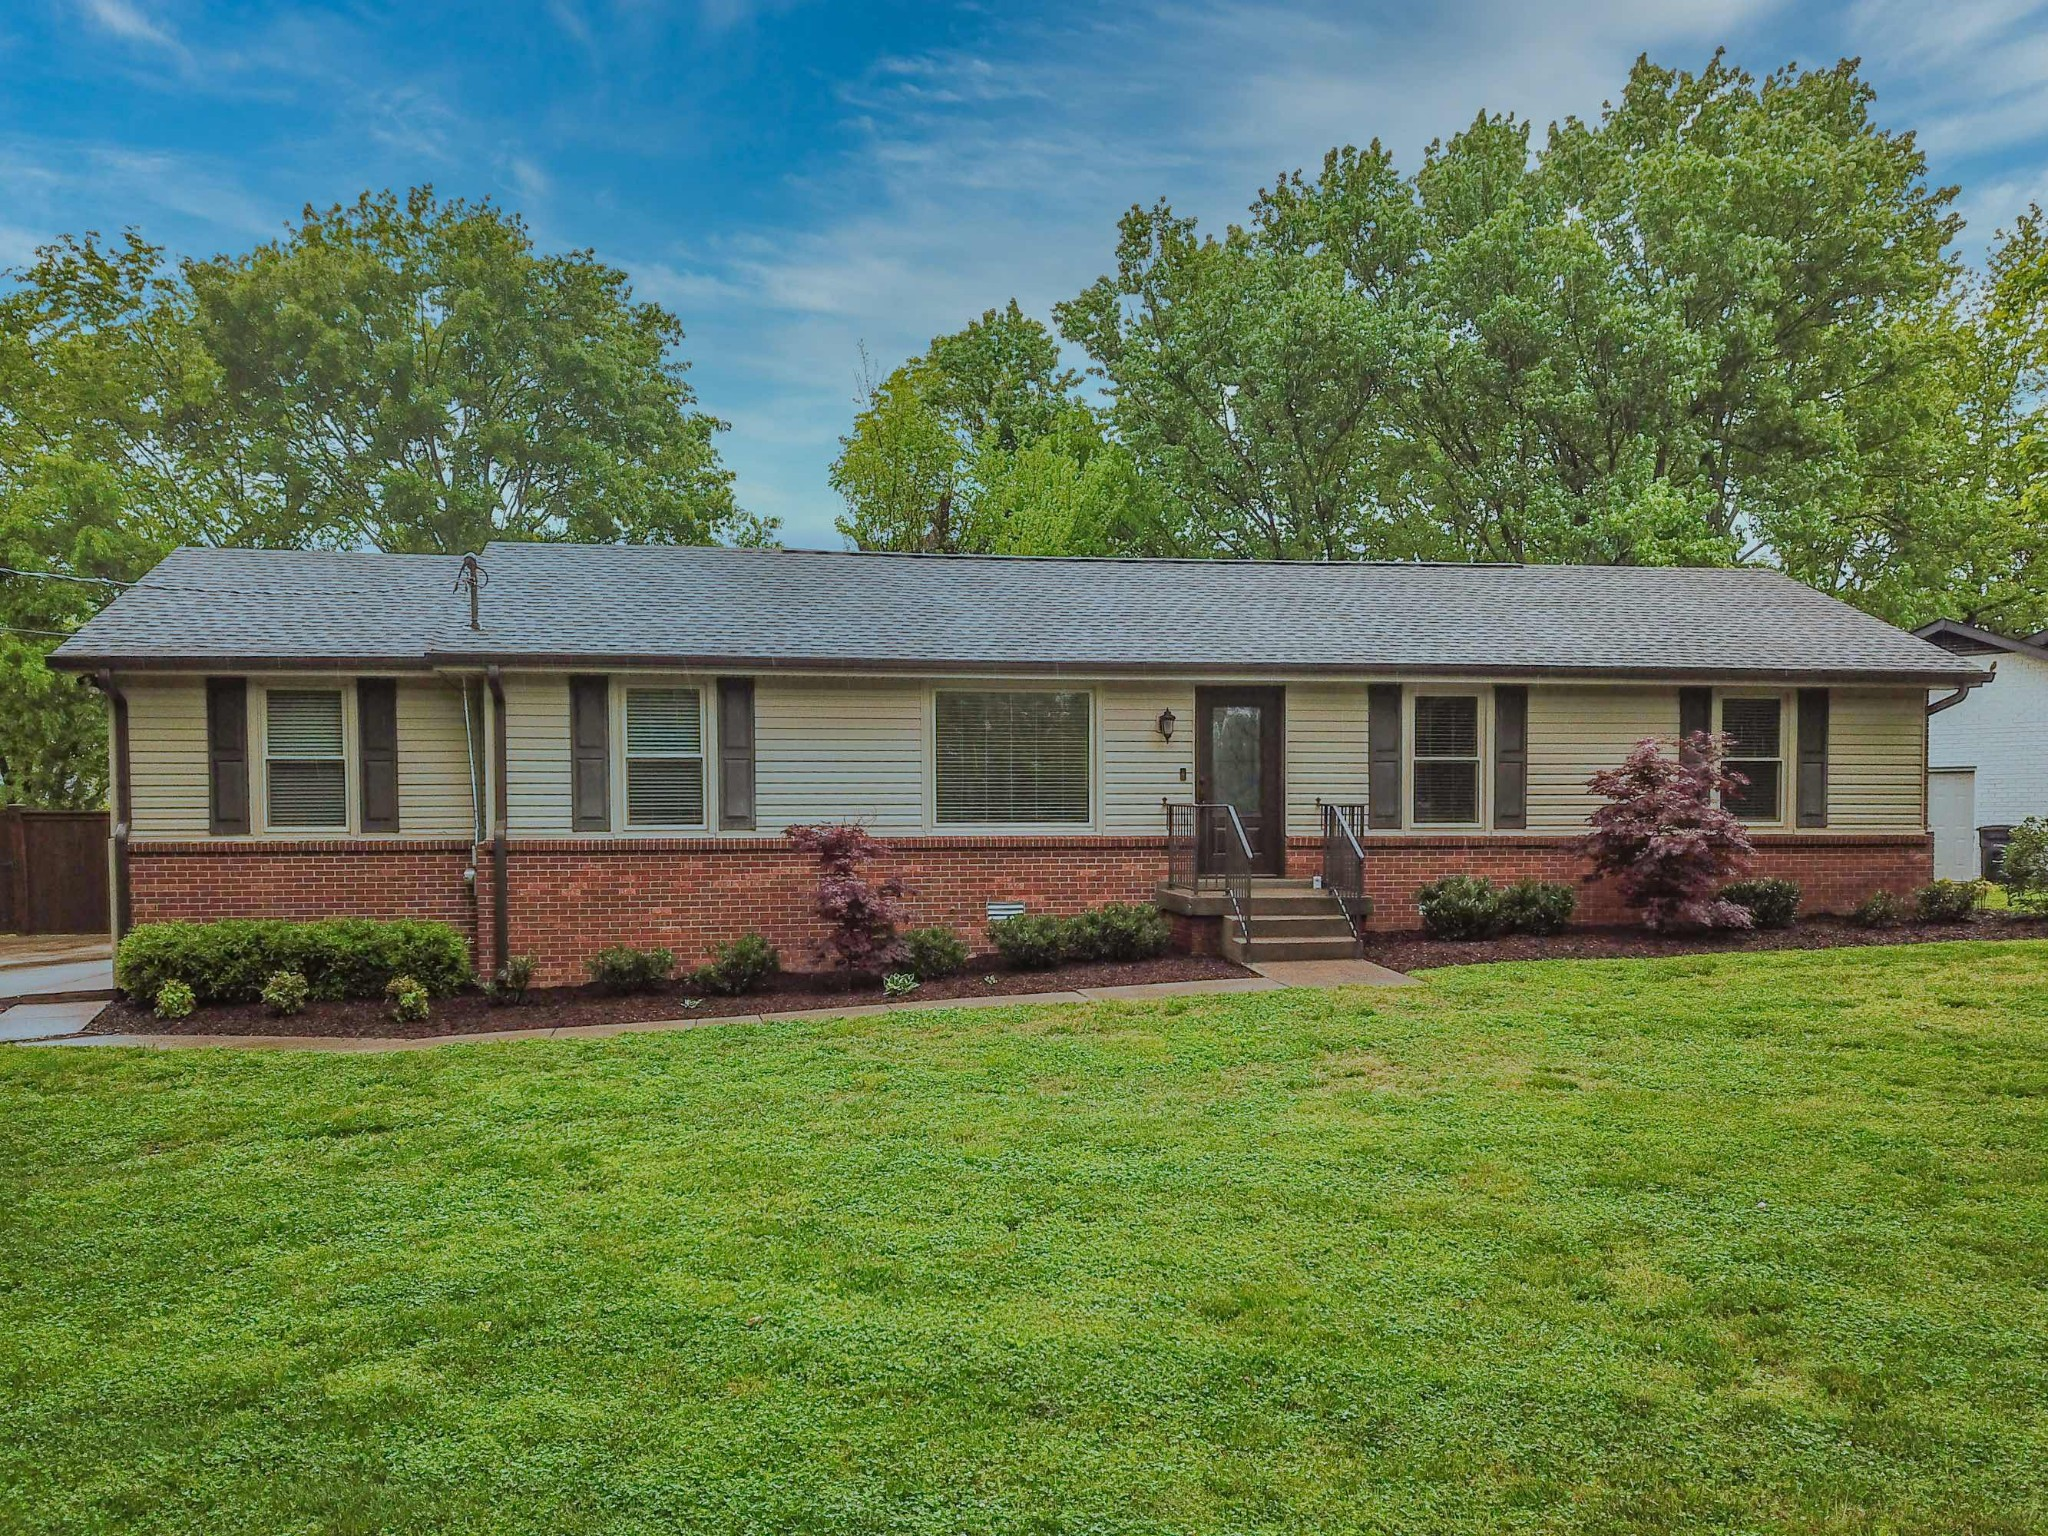 126 Hillside Dr Property Photo - Hendersonville, TN real estate listing